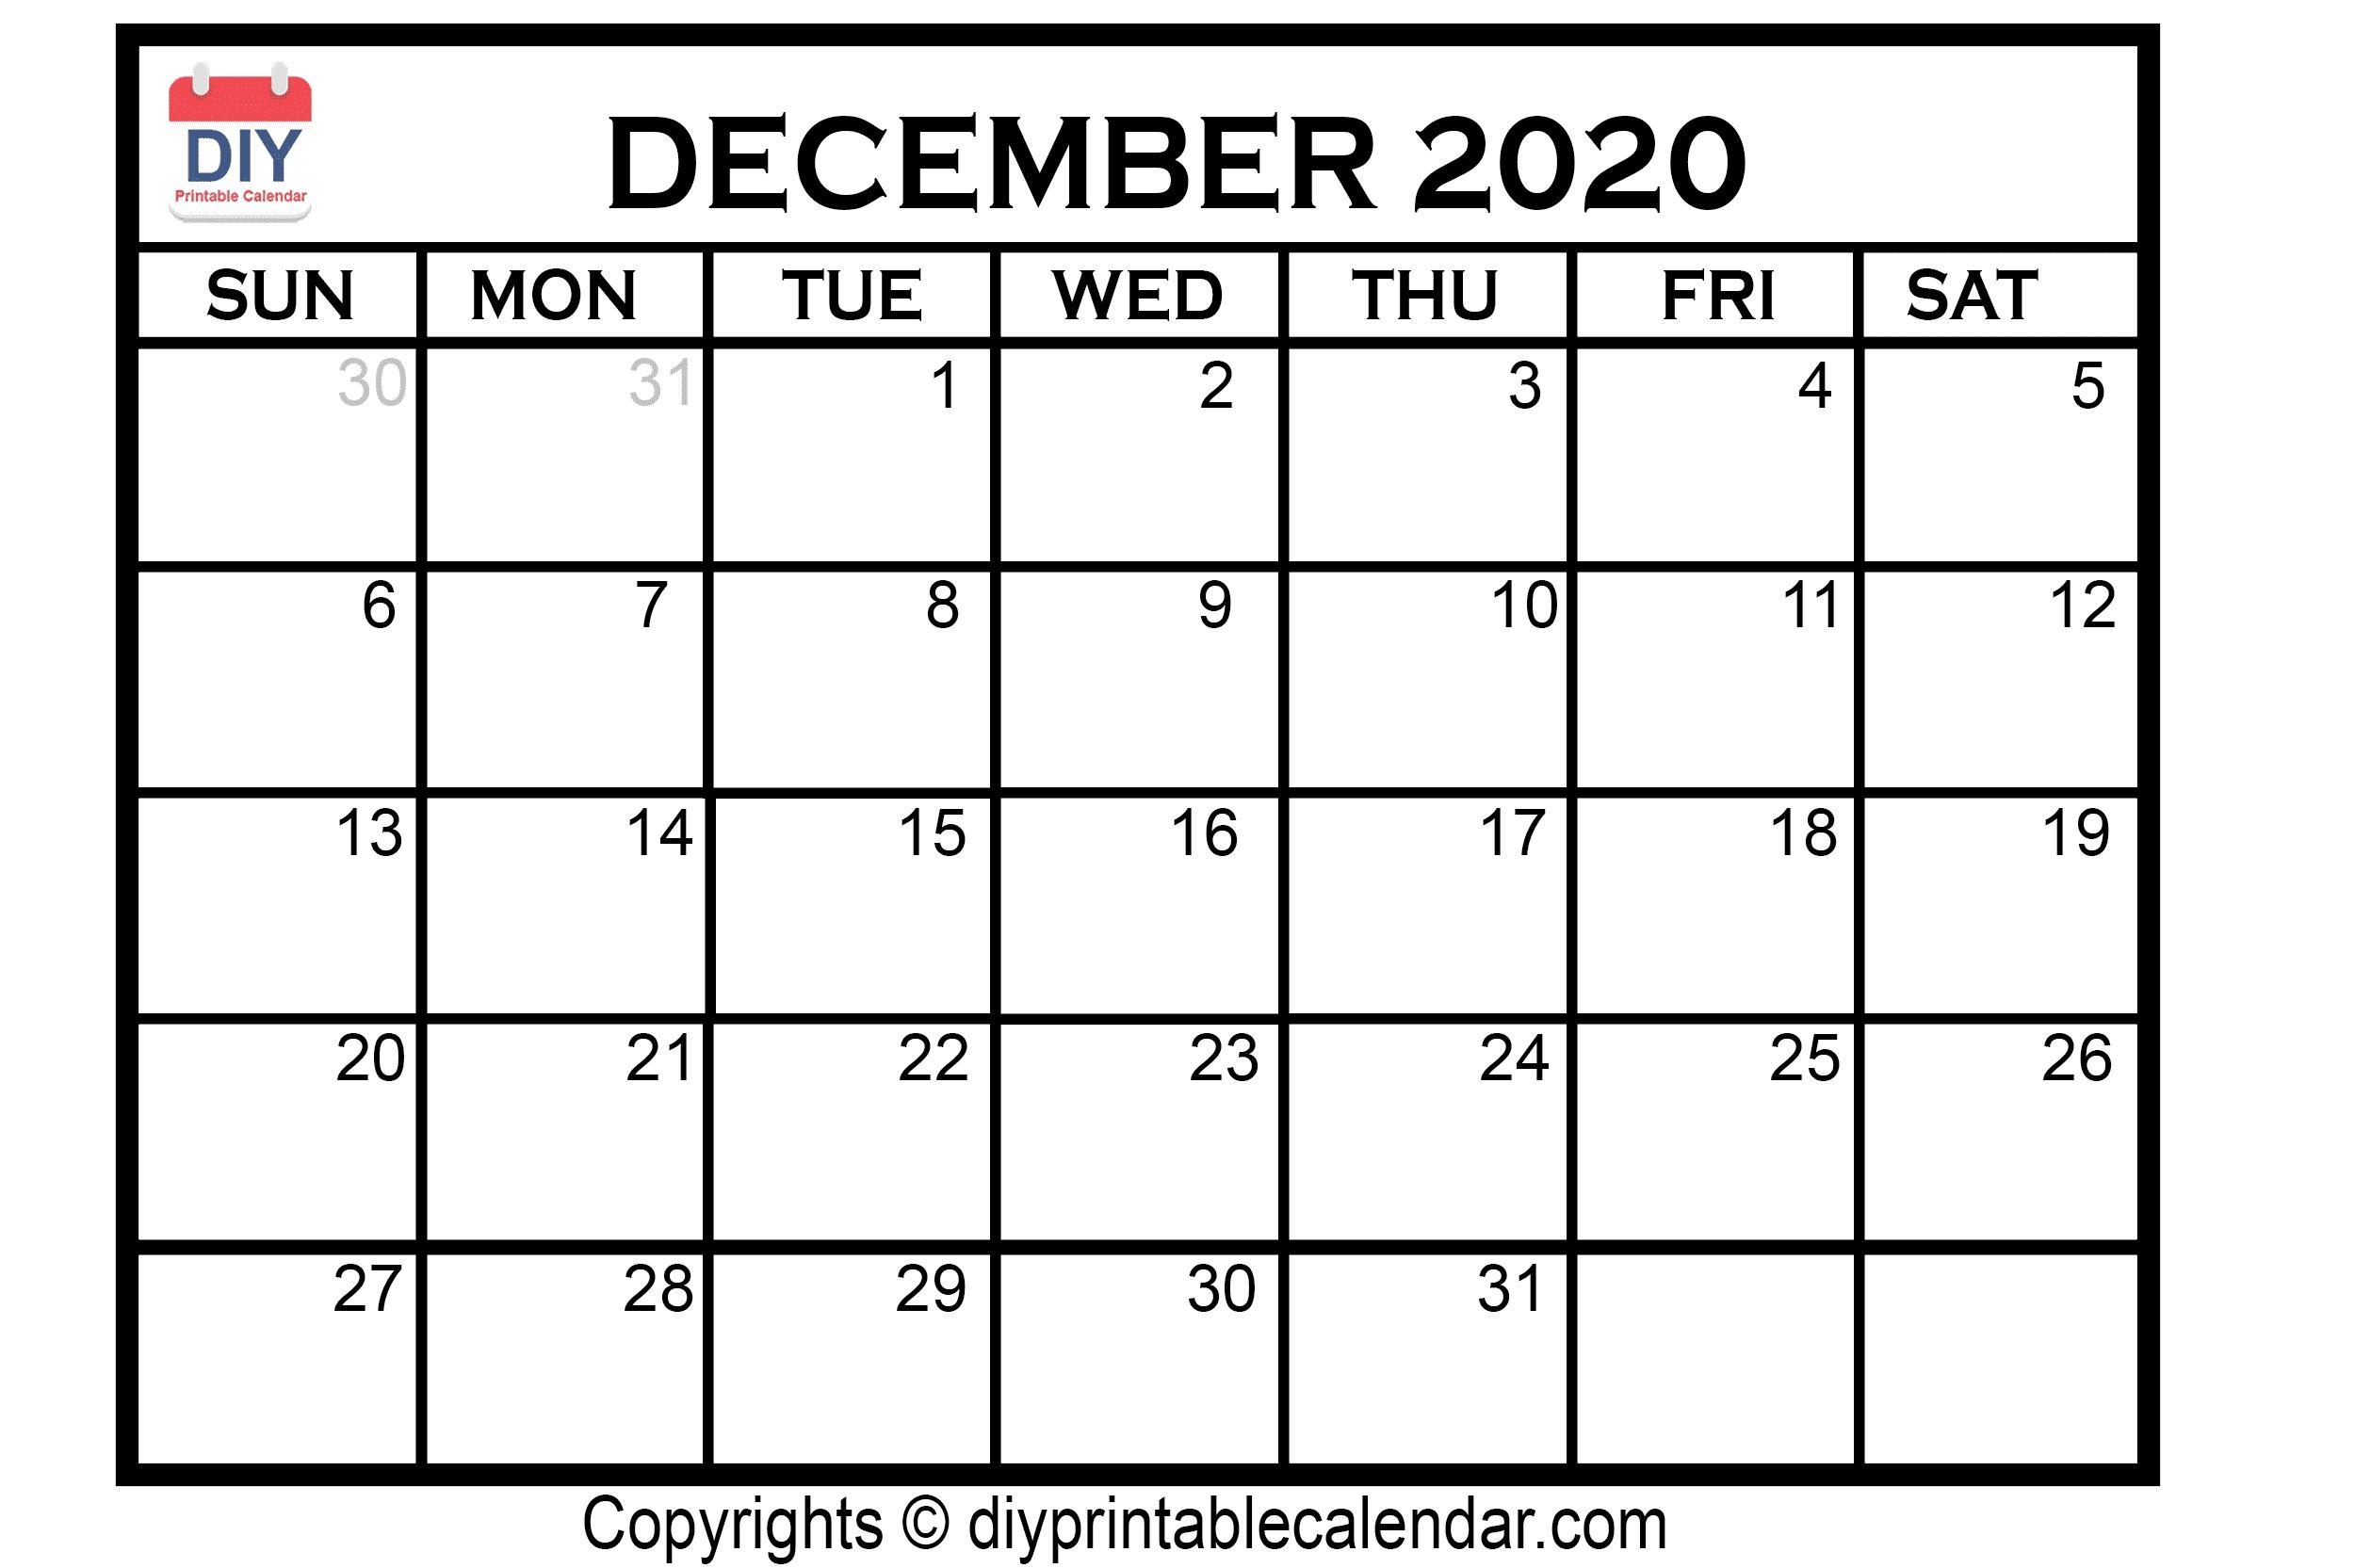 Dashing December 2020 Calendar List Format In 2020 regarding 2021 Pa Rut Prediction